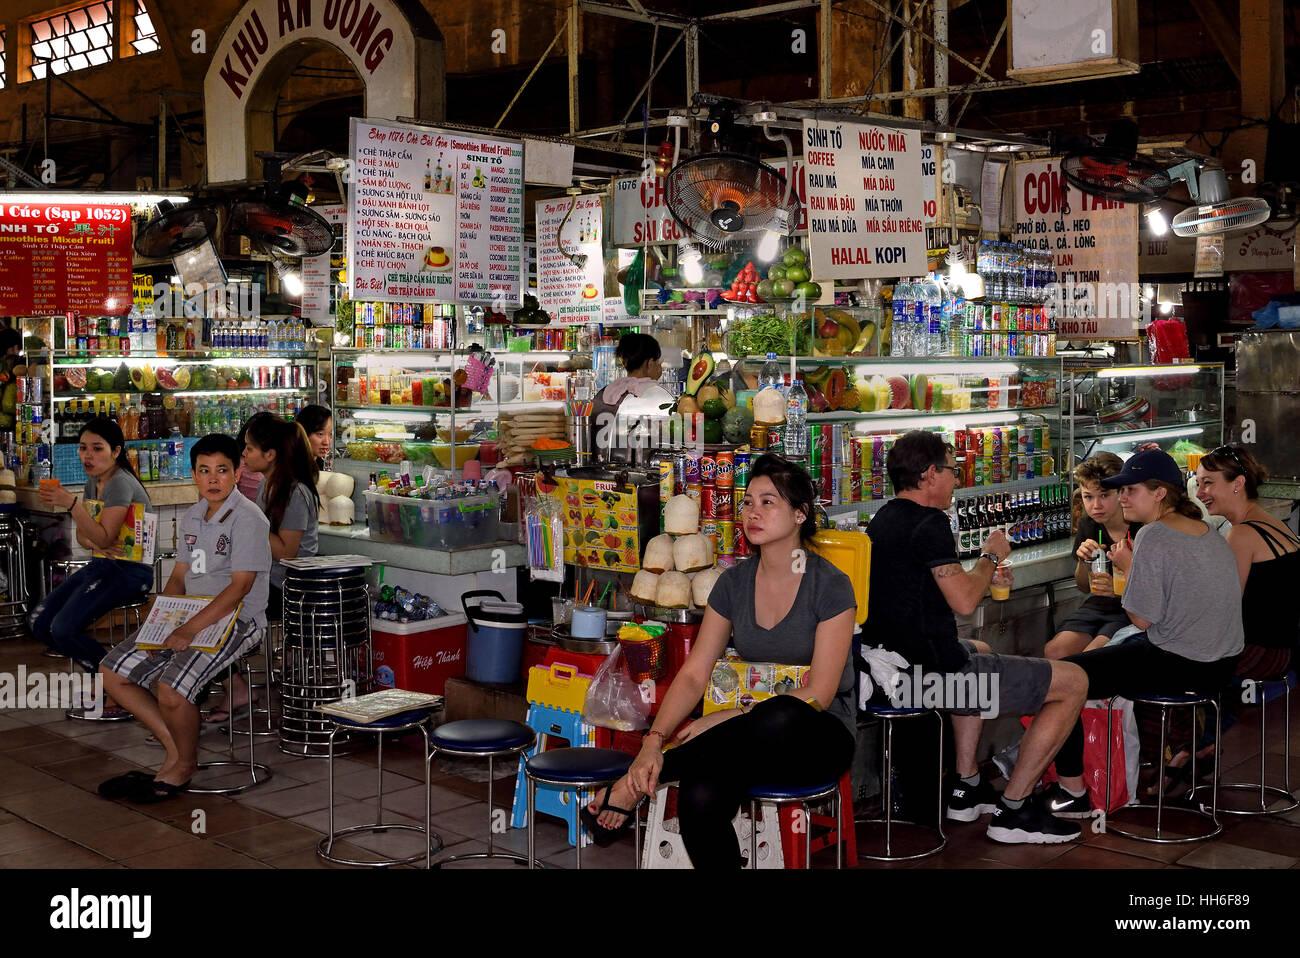 Street Food Night Market Ho Chi Minh City Center (HCMC) Saigon ( dizzying high octane city of trade commerce and Stock Photo